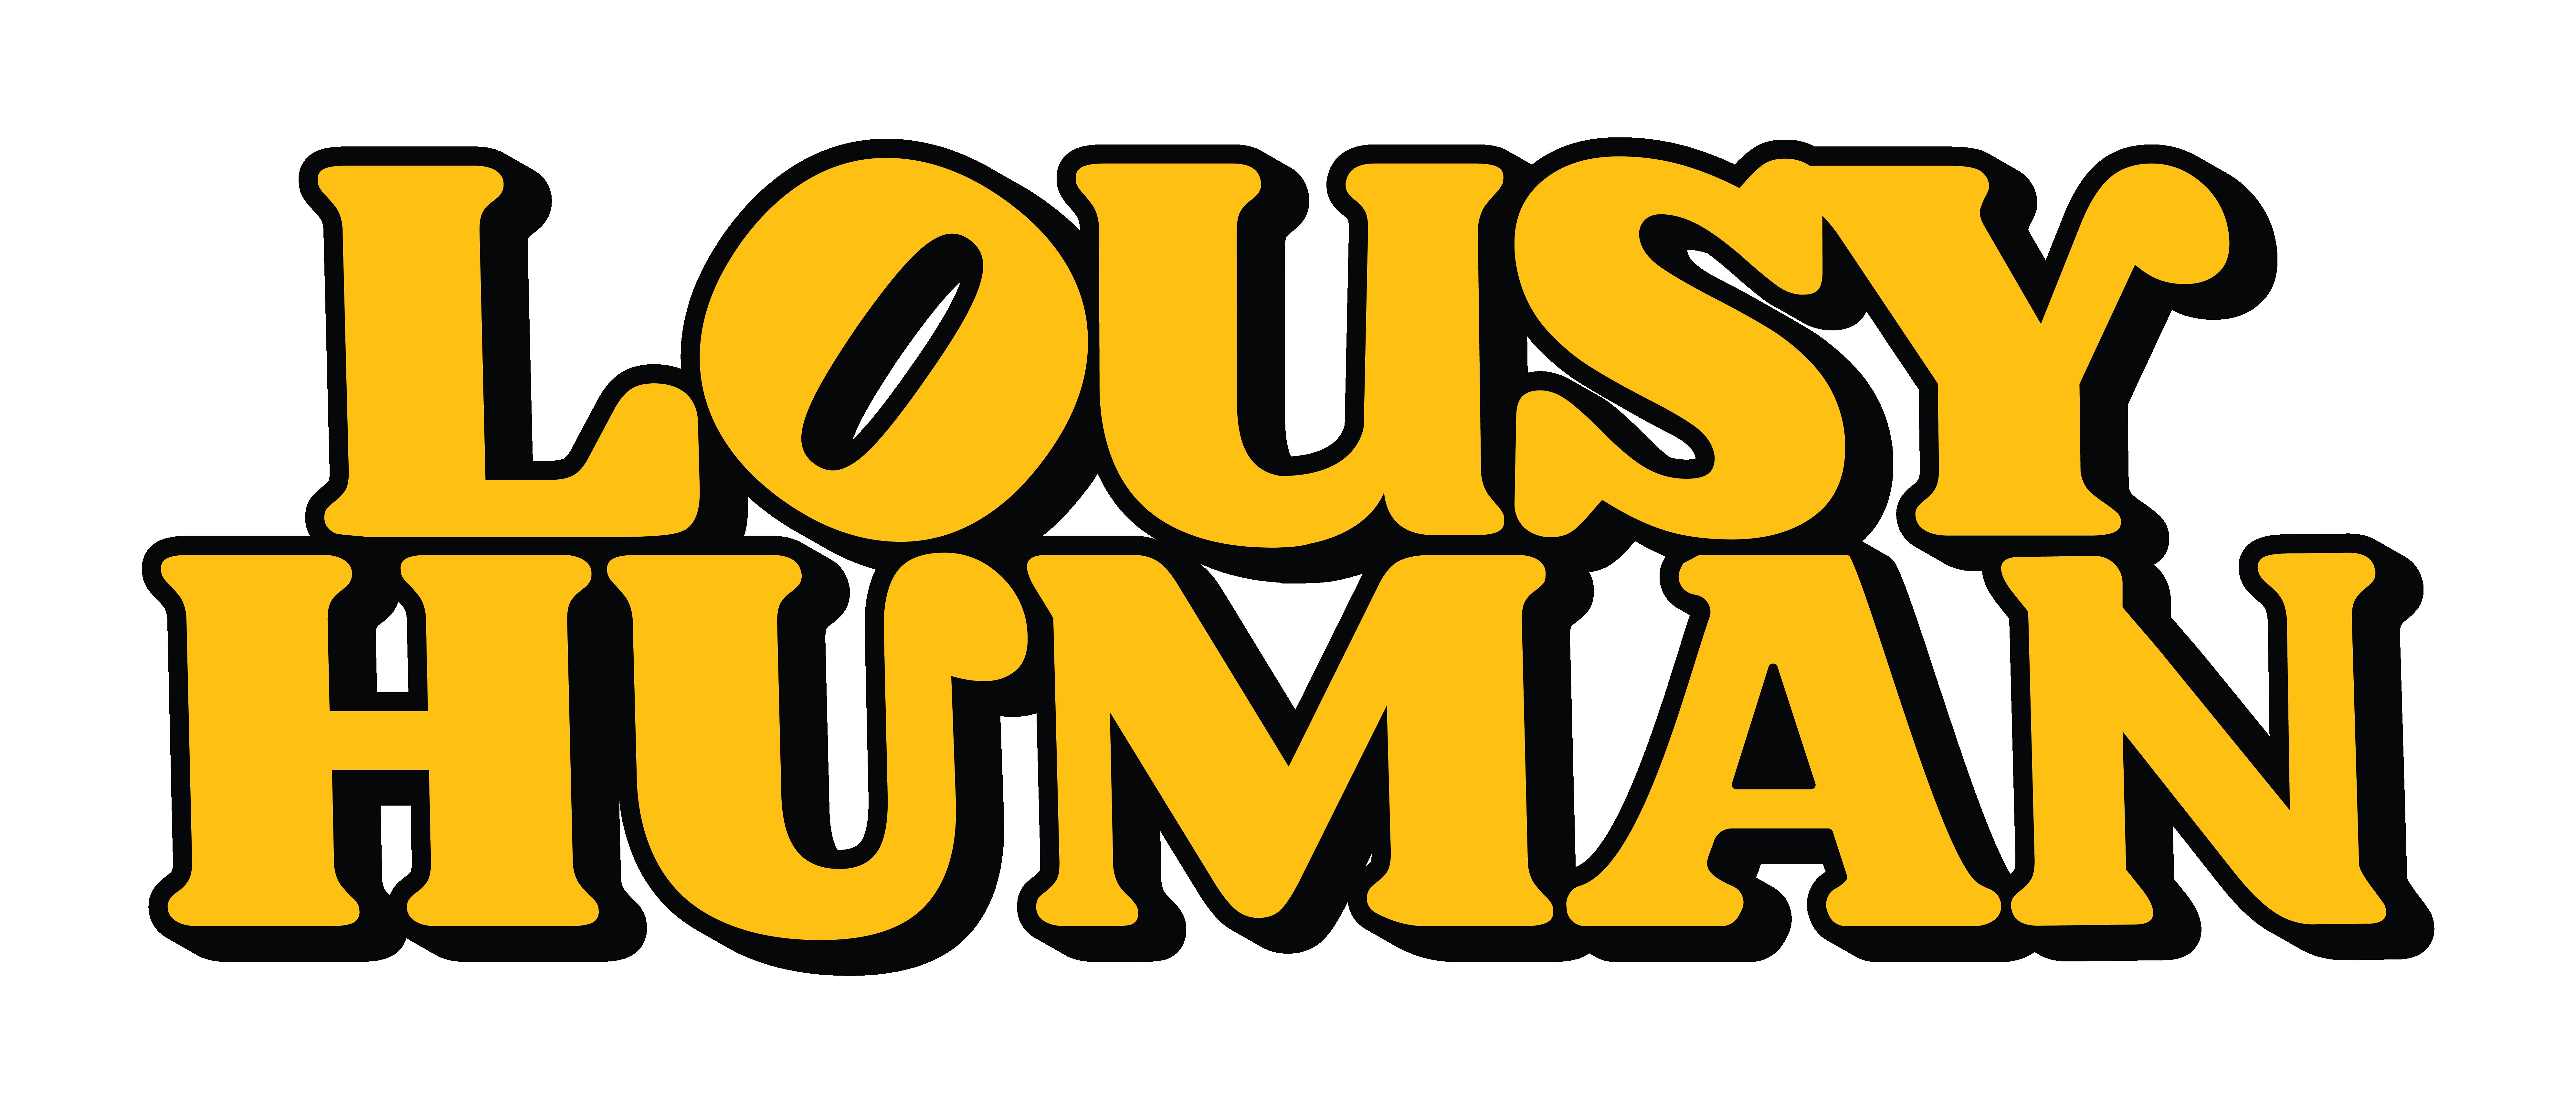 Lousy Human